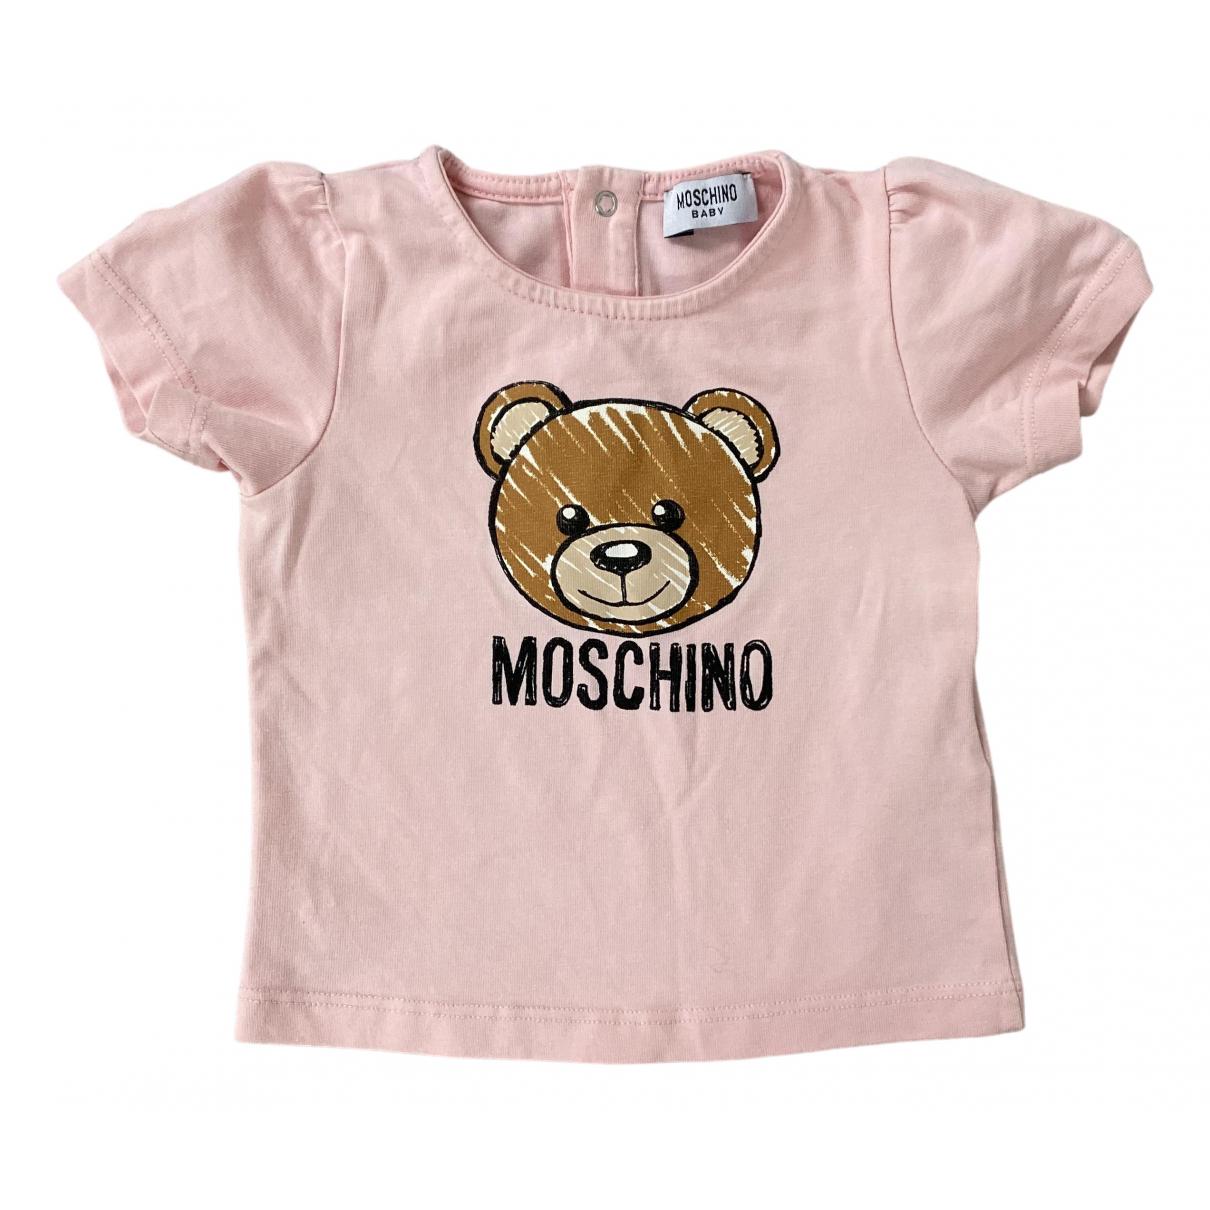 Moschino - Top   pour enfant en coton - rose